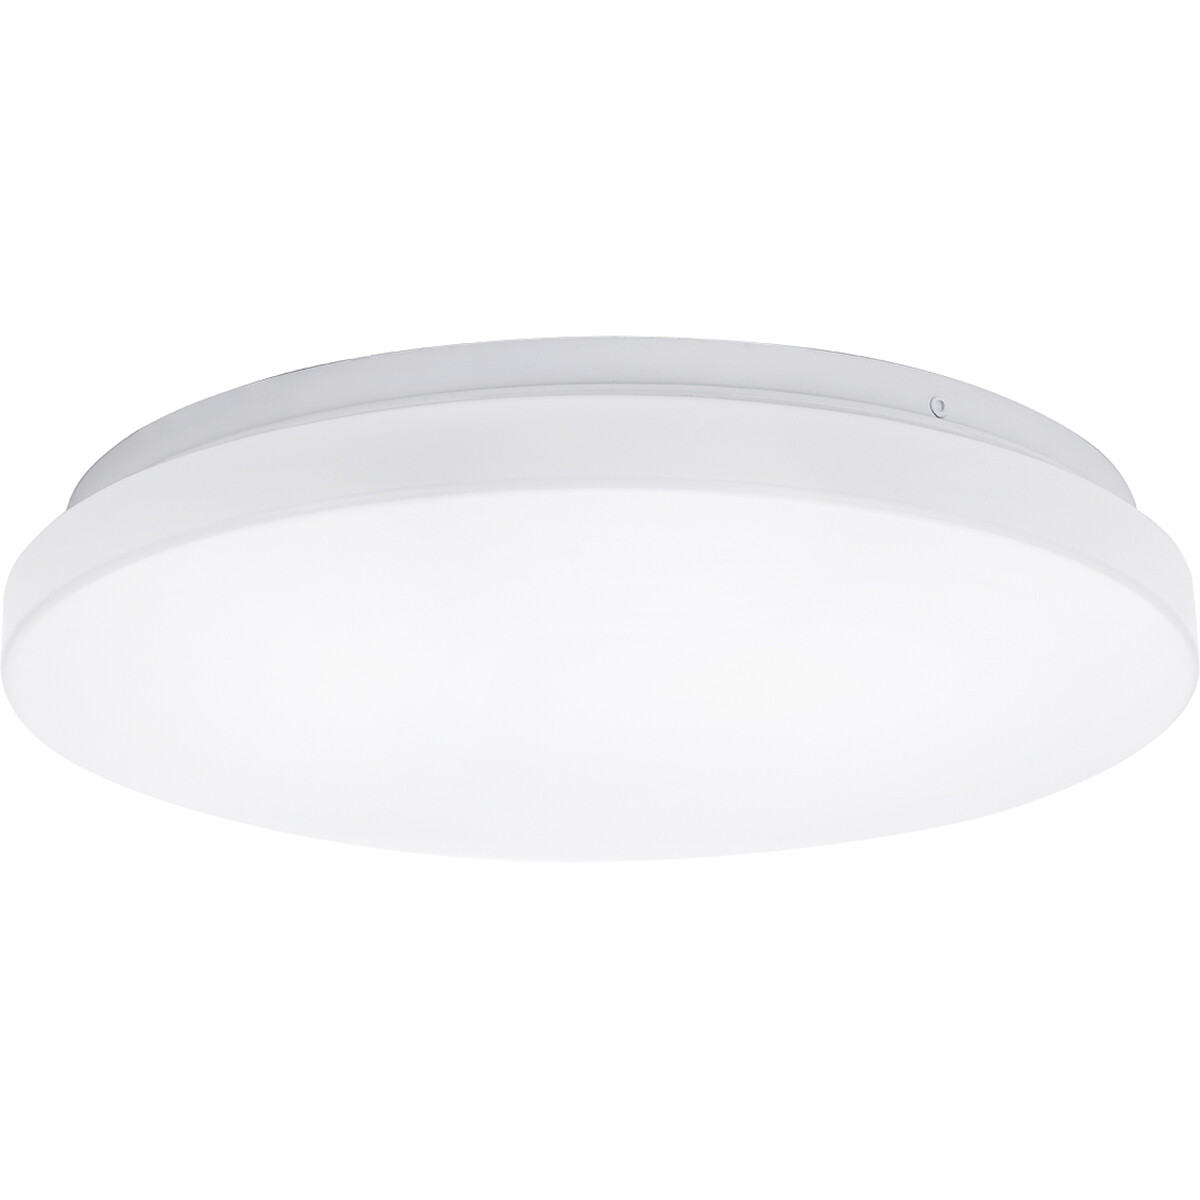 LED Plafondlamp - Aigi Syna - Opbouw Rond 20W - Helder/Koud Wit 6500K - Mat Wit - Aluminium